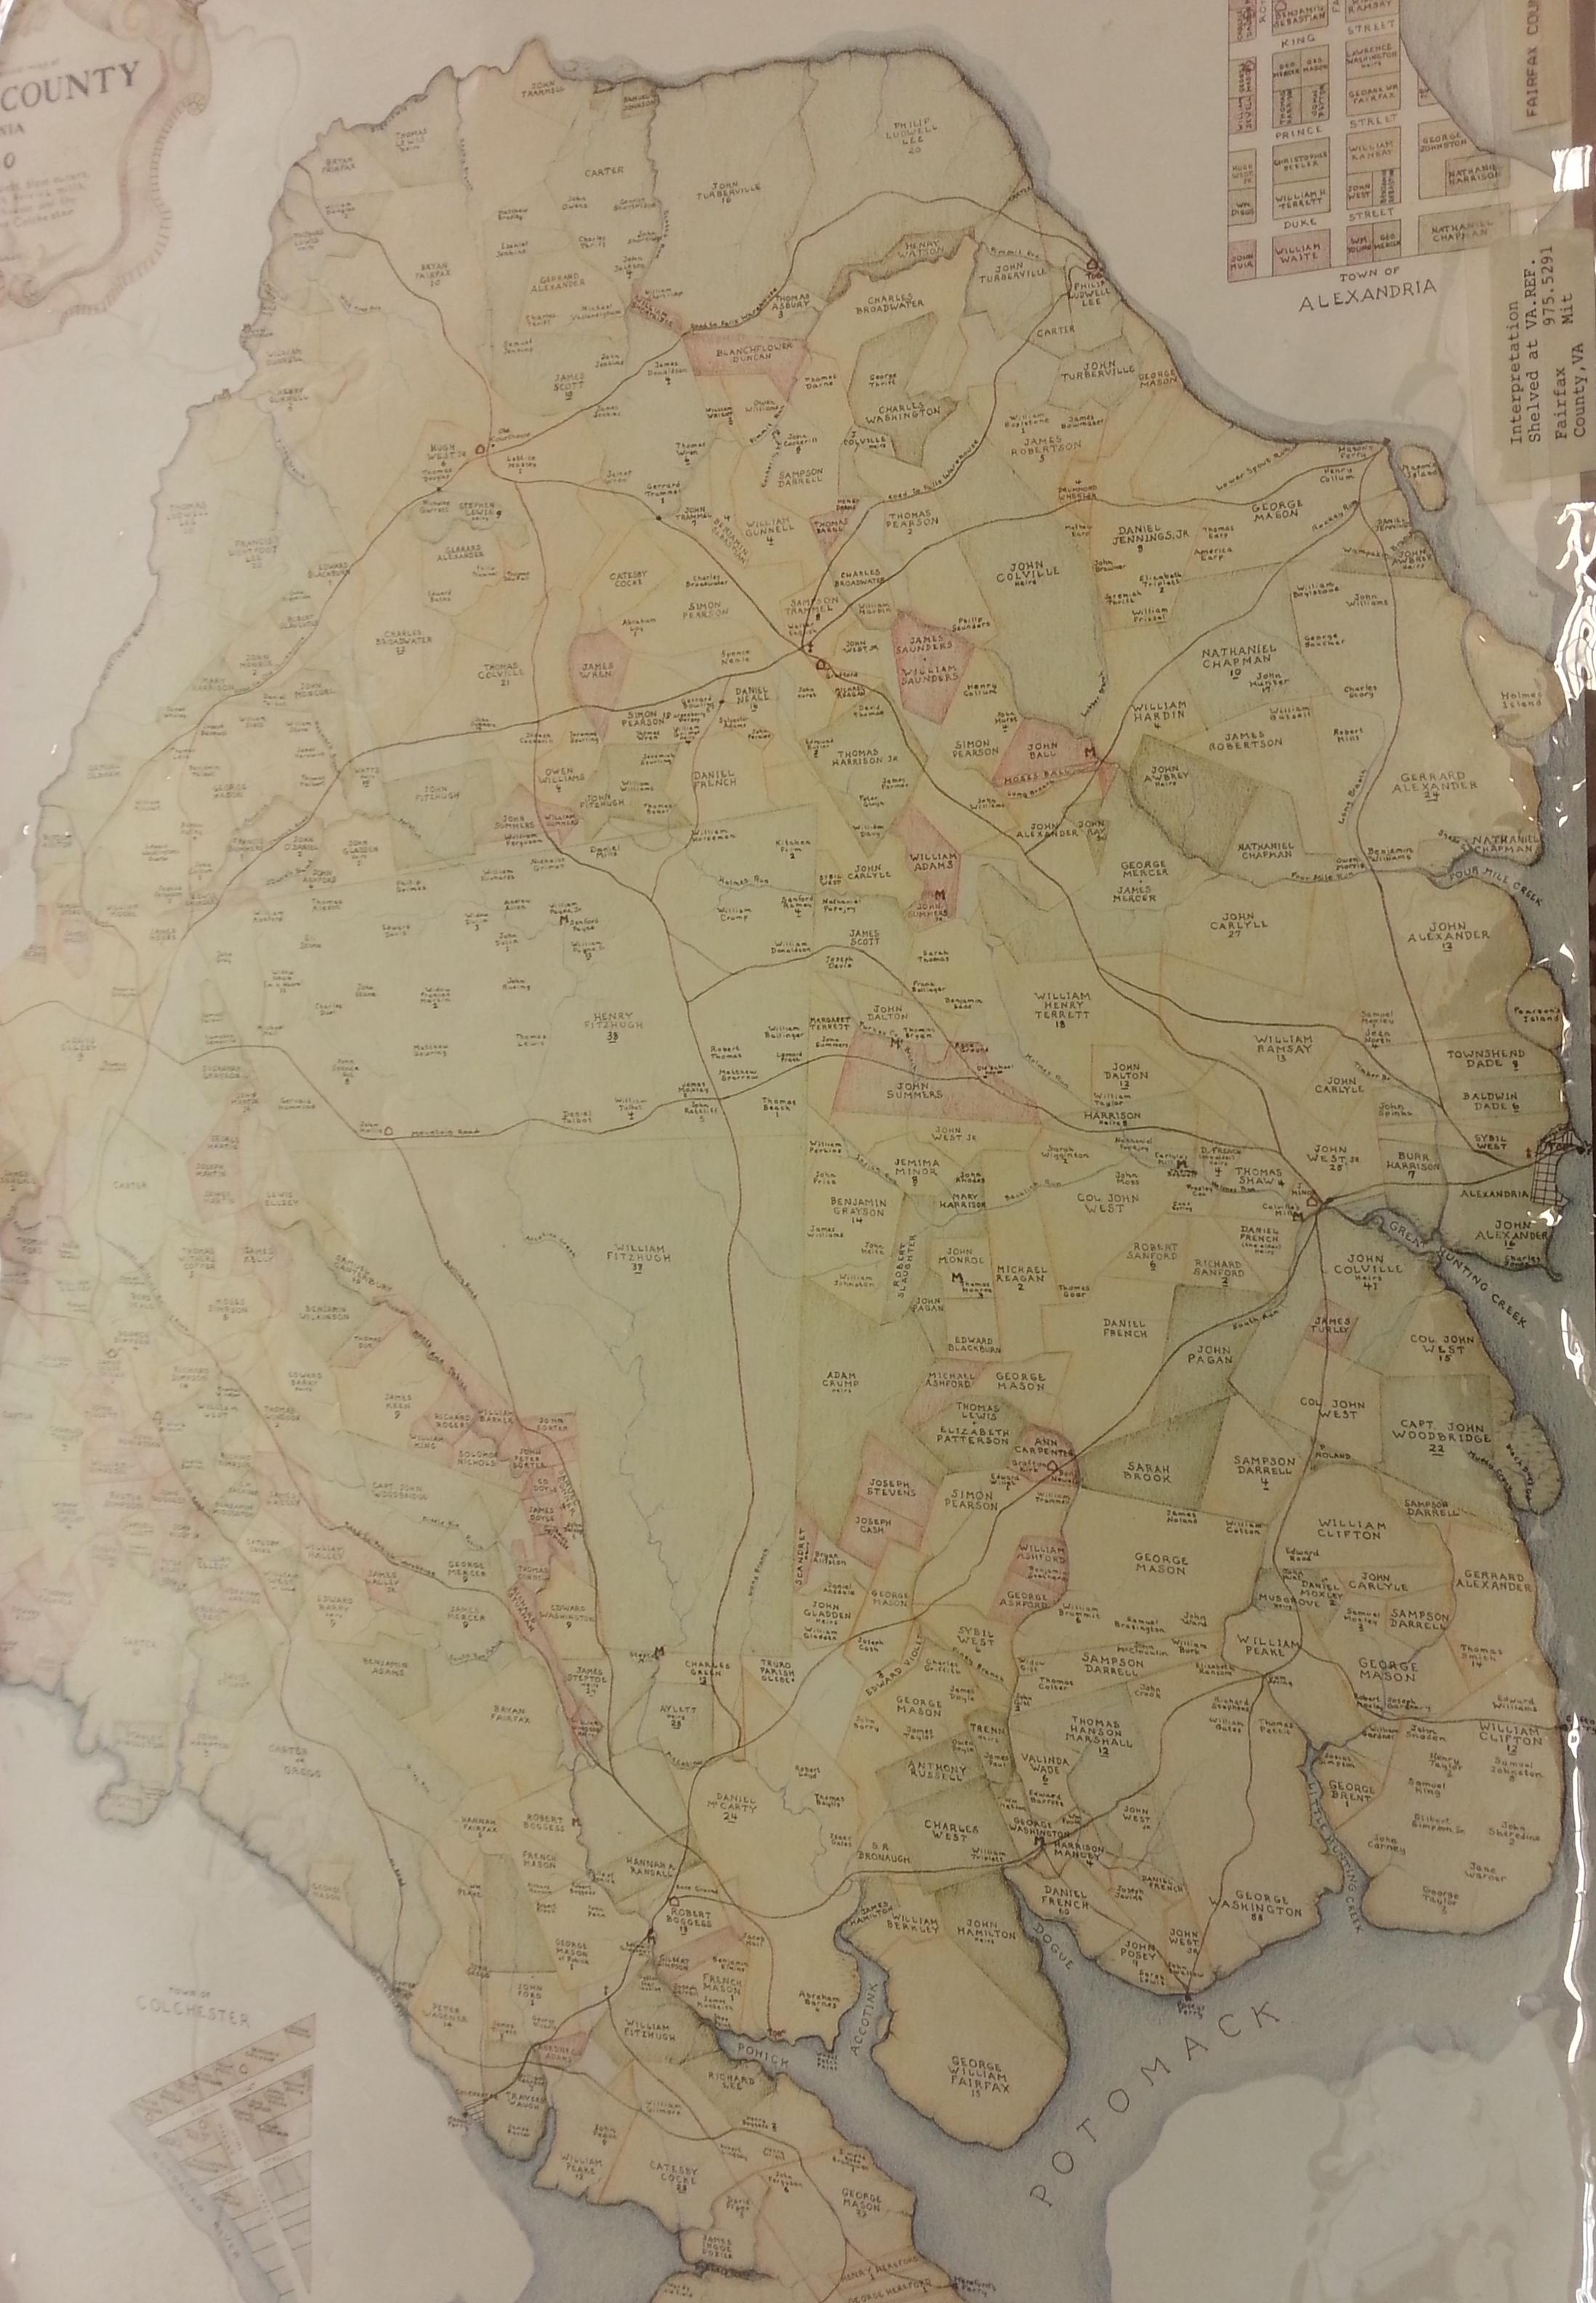 Jaybird's Jottings: Fairfax County Maps: Interpretive ... on prince william co map, loudoun county map, manassas county map, stafford county map, prince william county map, fairfax weather, fairfax virginia, queen anne's county map, dc metropolitan area map, fauquier county map, stark county township map, monroe county map, fairfax south carolina, fairfax hospital parking, alexandria map, northern virginia county map, fairfax city, linn county county map, arlington map, deer park county map,